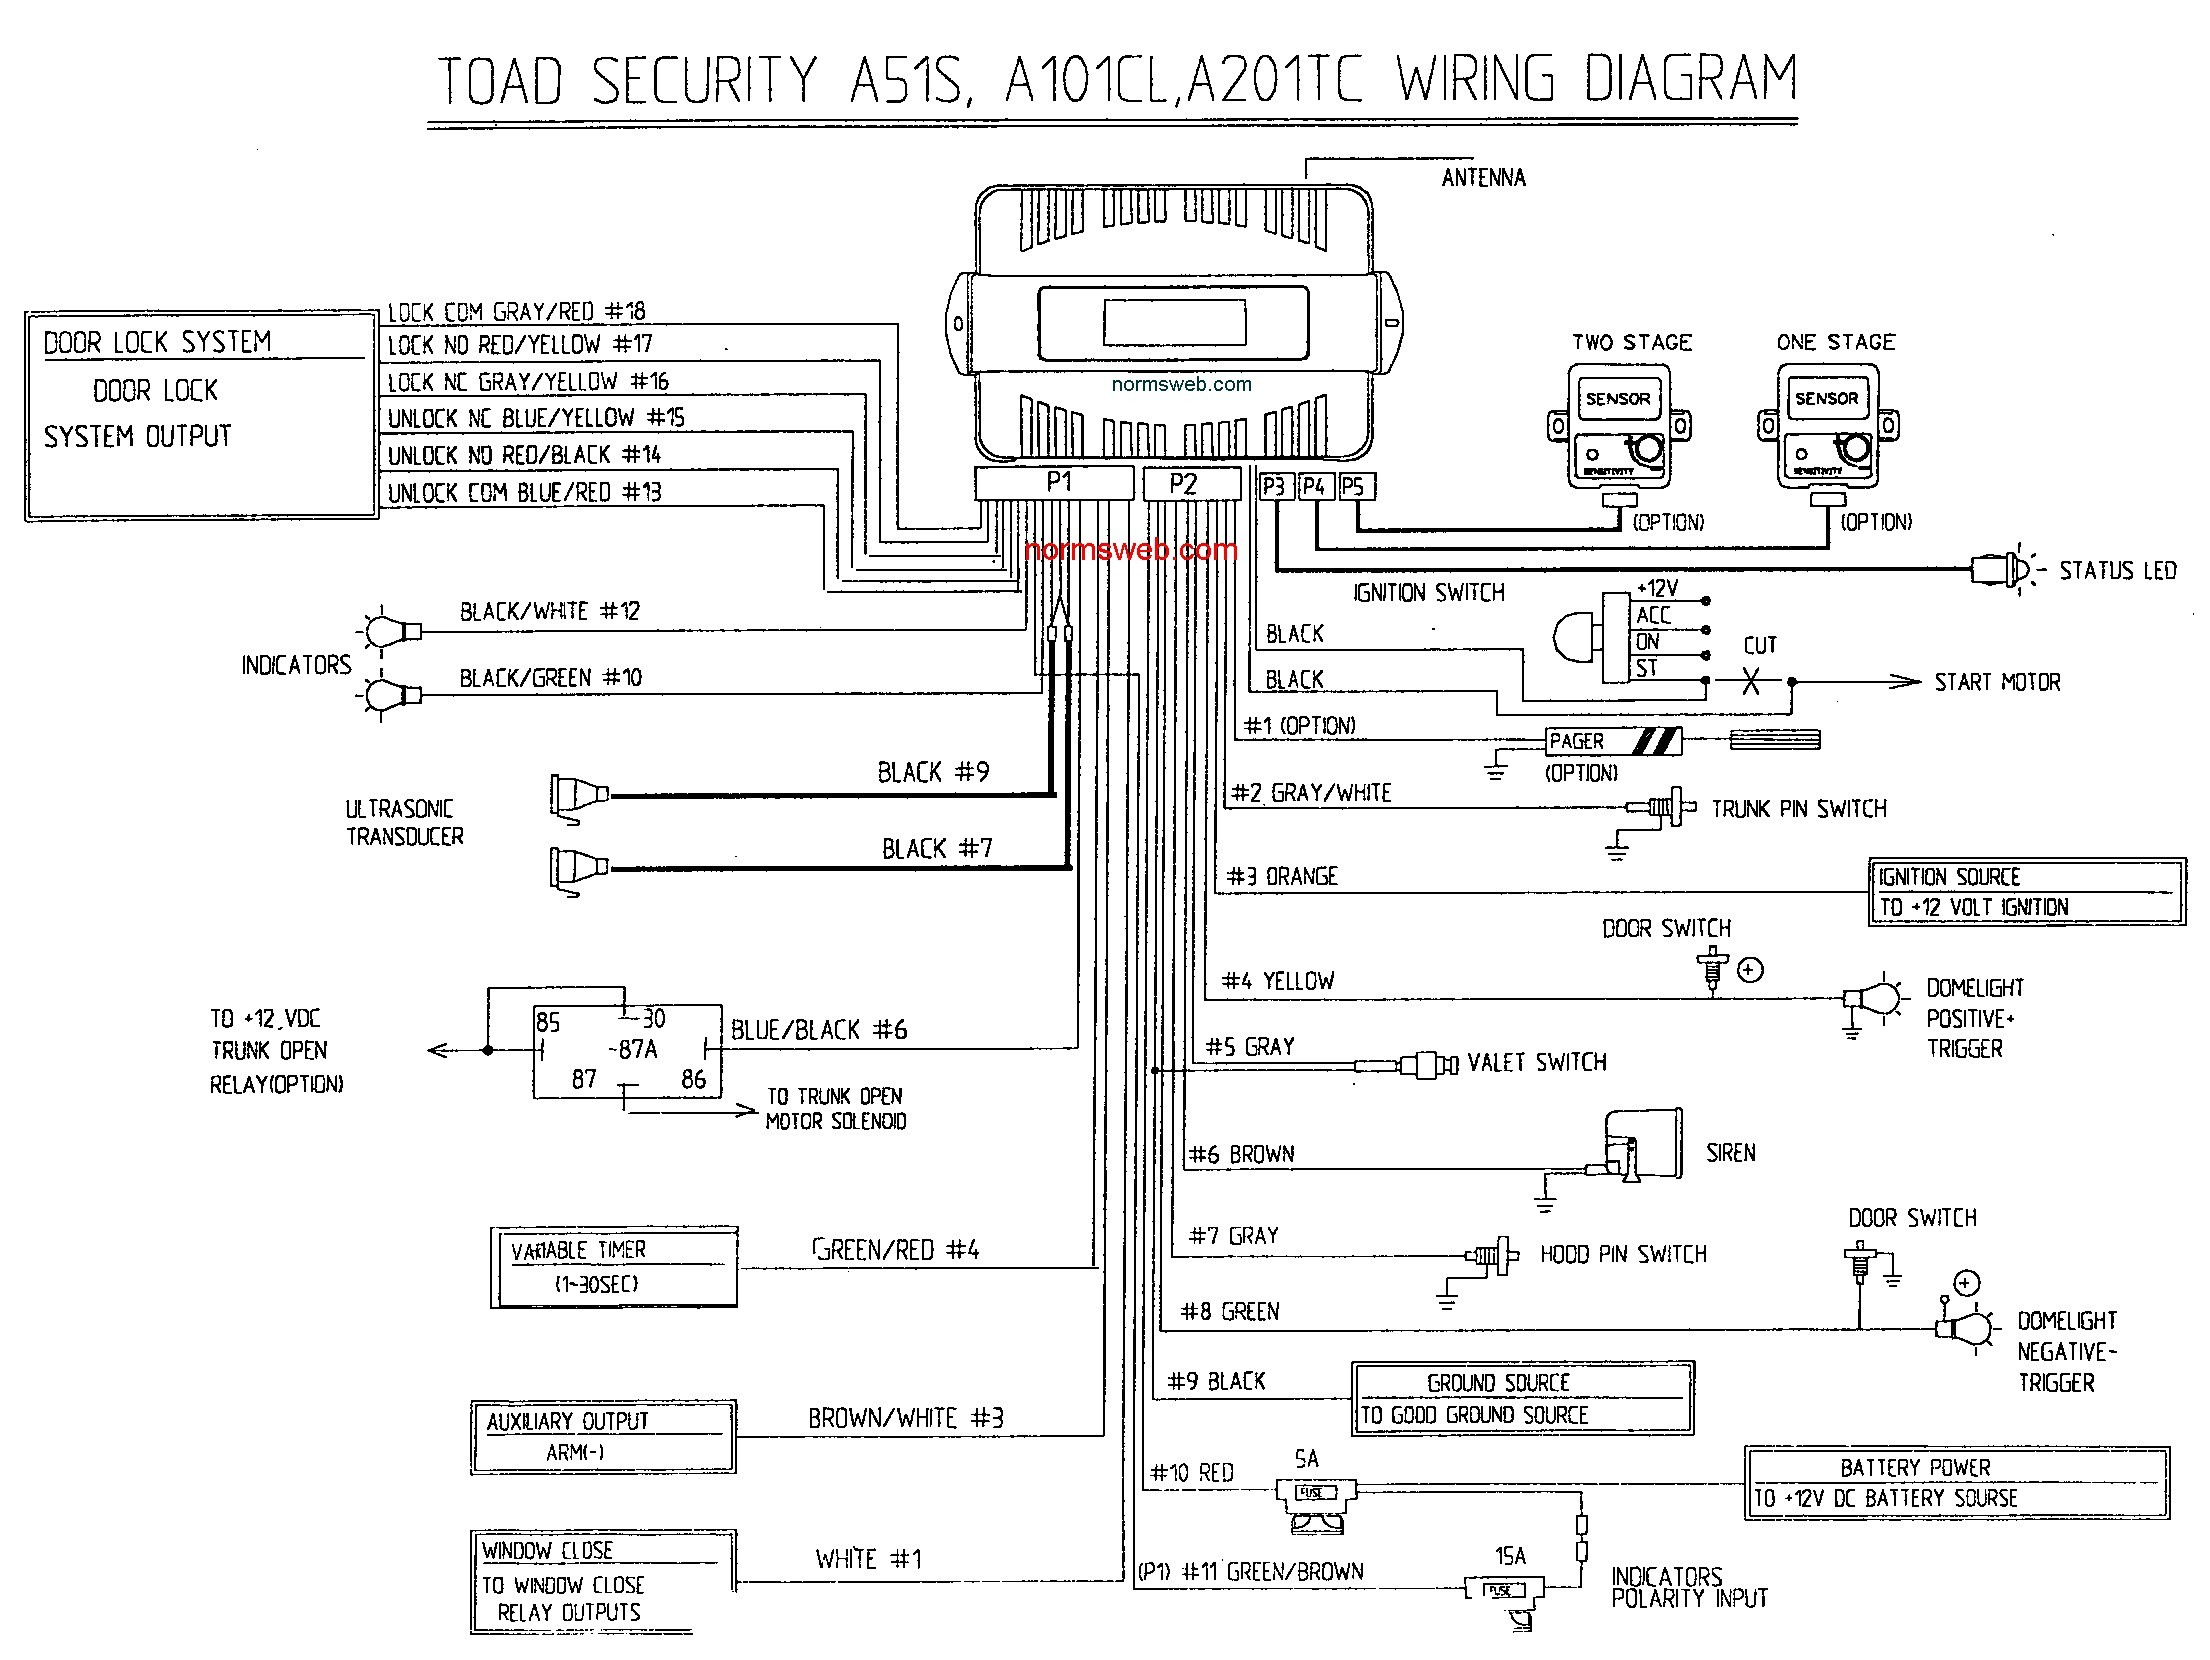 Audiovox Car Alarm Wiring Diagram Old Fashioned Audiovox Wiring Diagram Ensign Electrical Wiring Of Audiovox Car Alarm Wiring Diagram